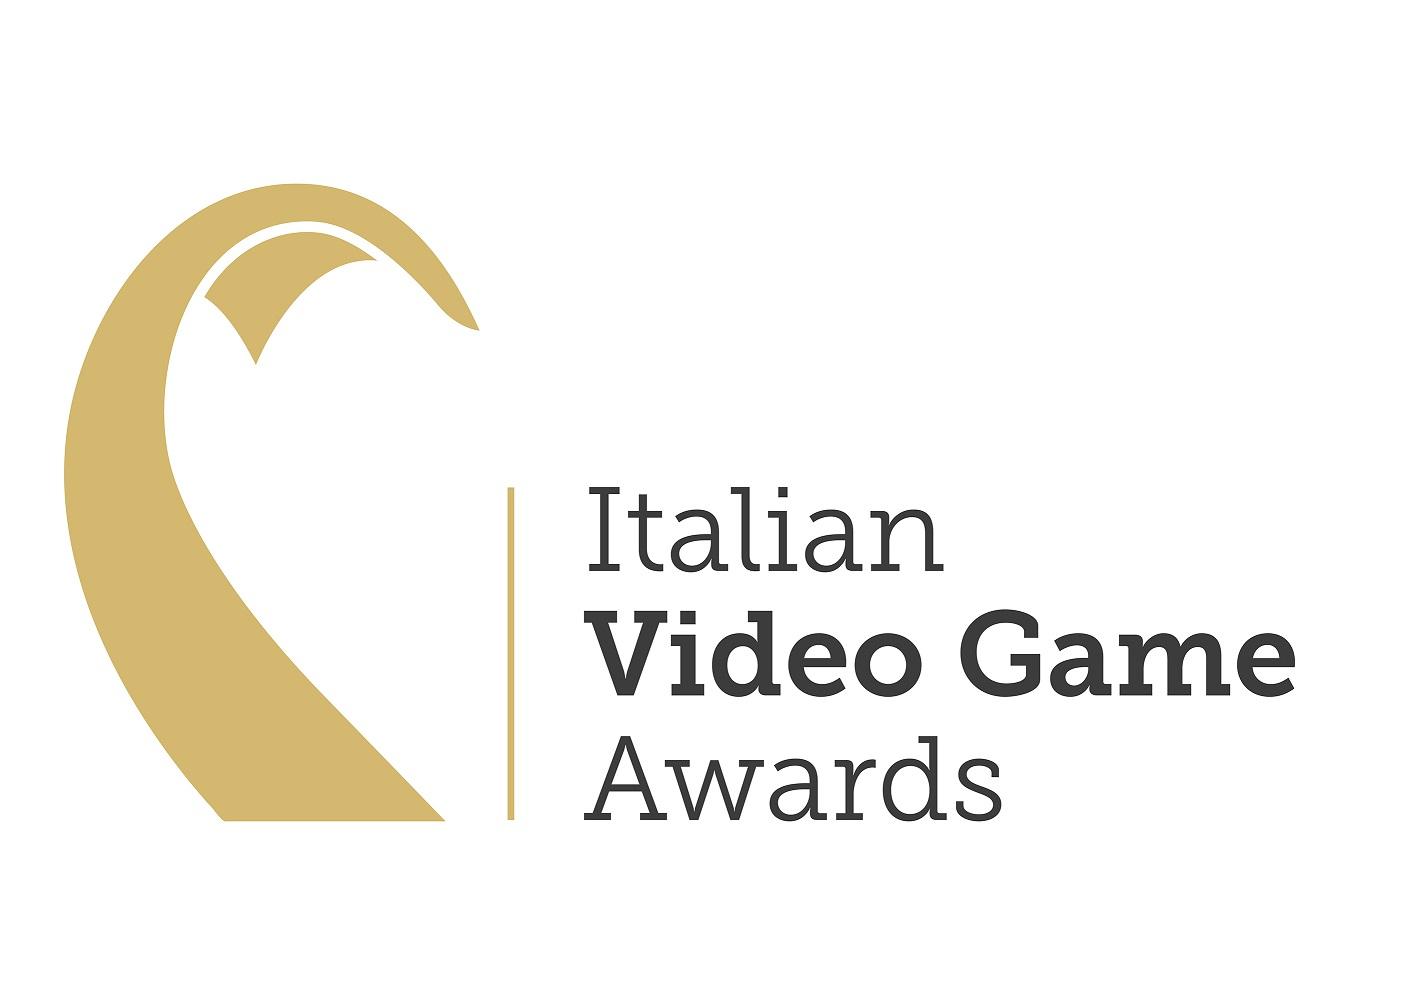 Italian Video Game Awards logoB